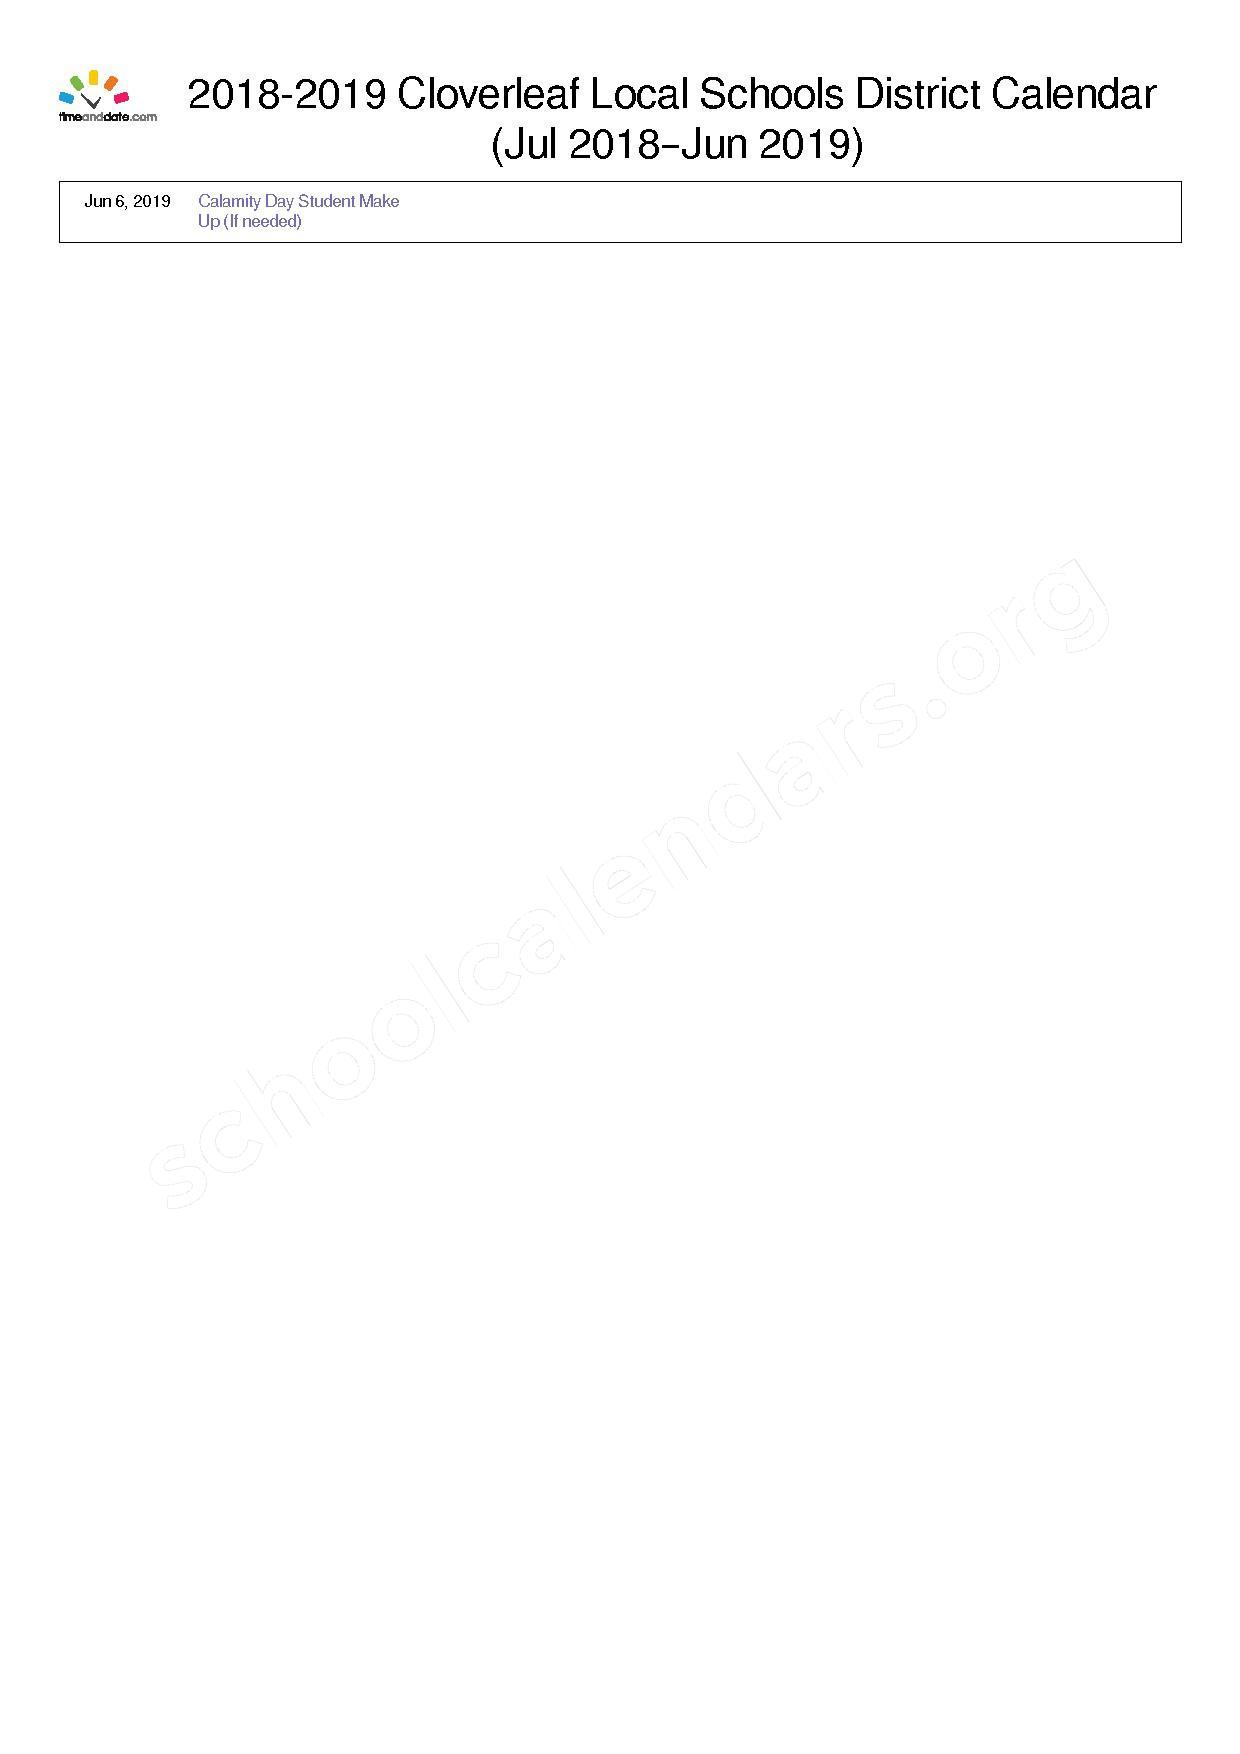 2018 - 2019 District Calendar – Cloverleaf Local Schools – page 2